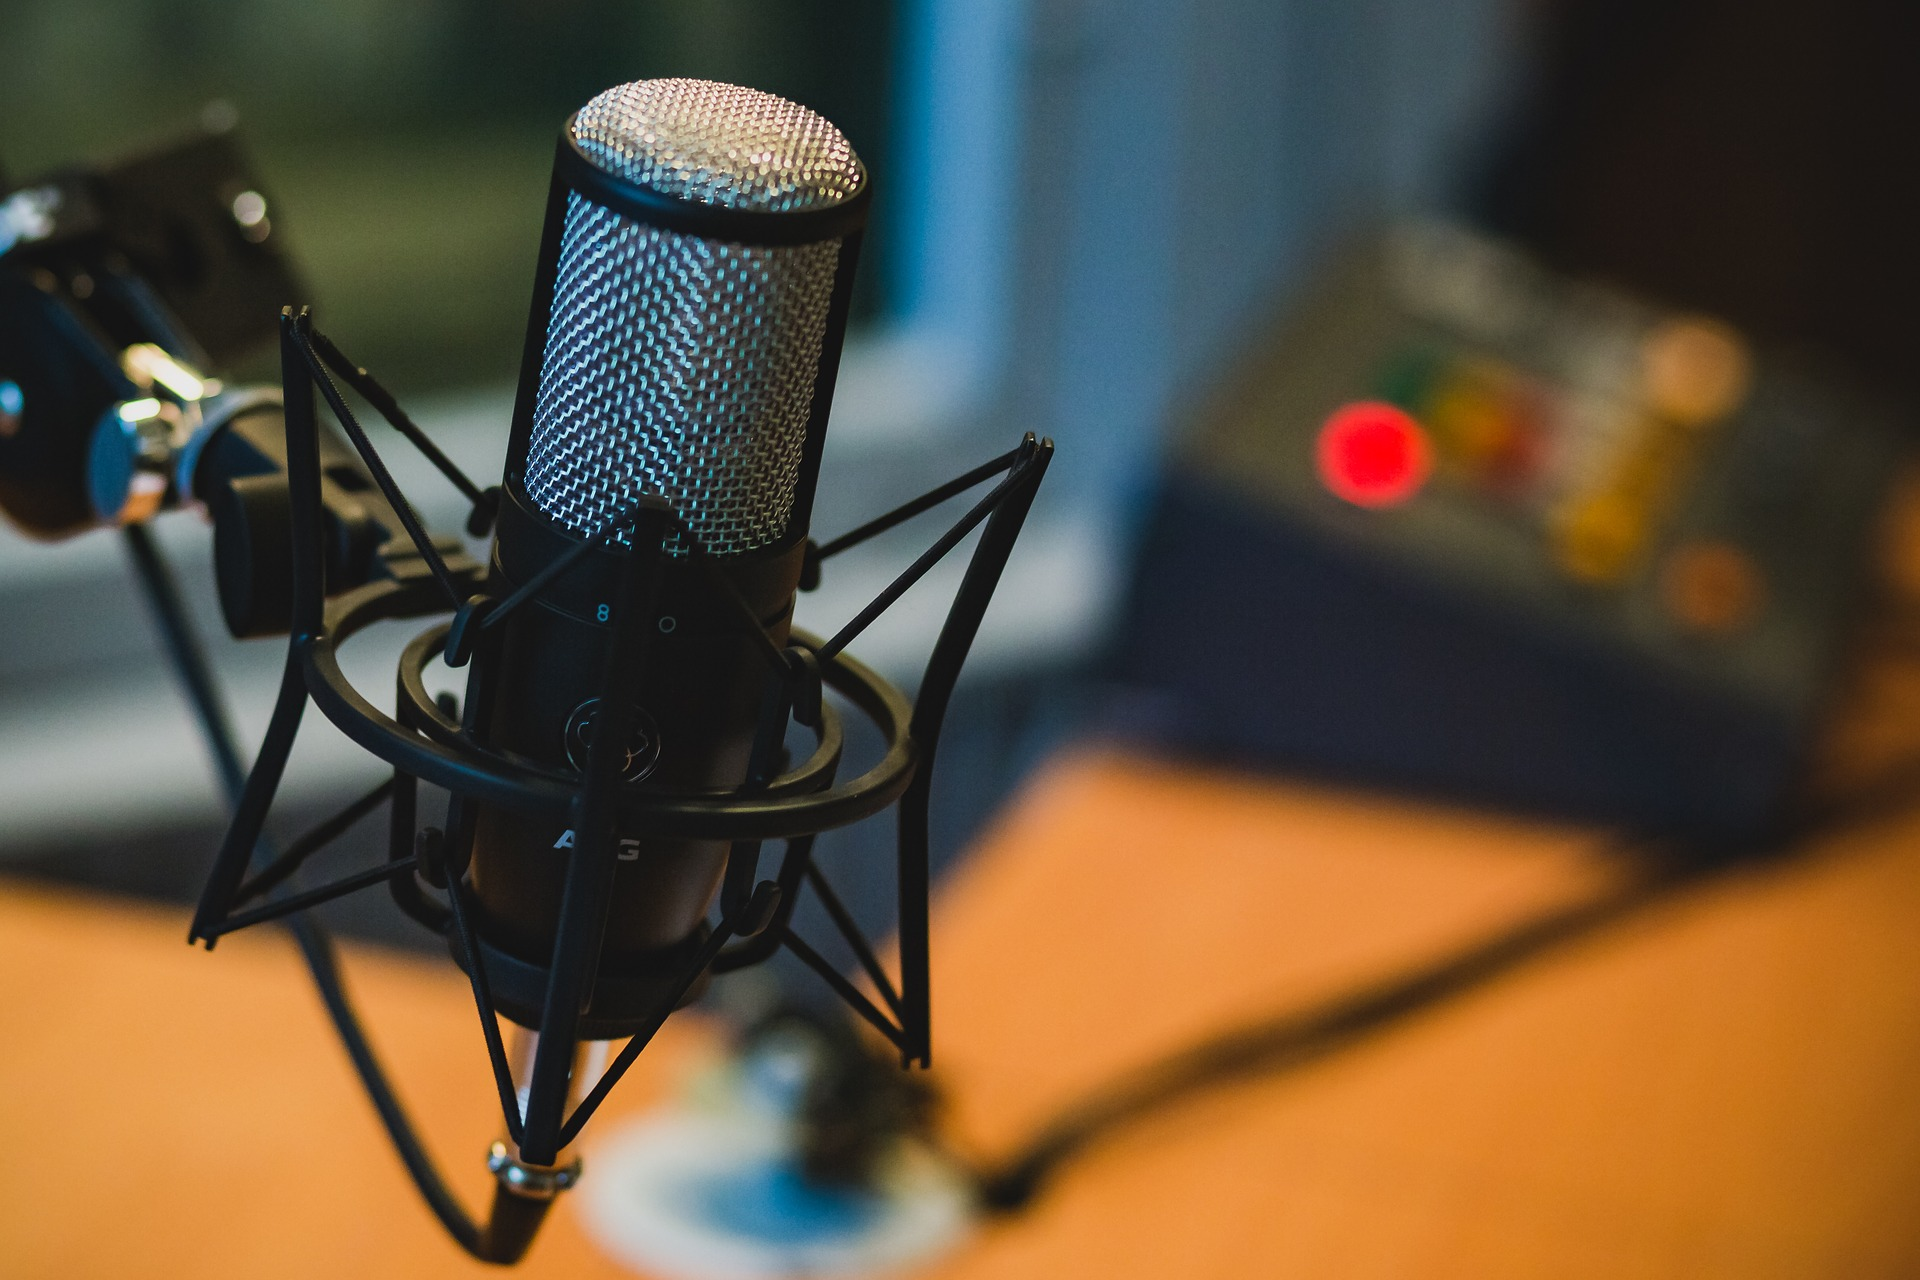 Podcastfolge